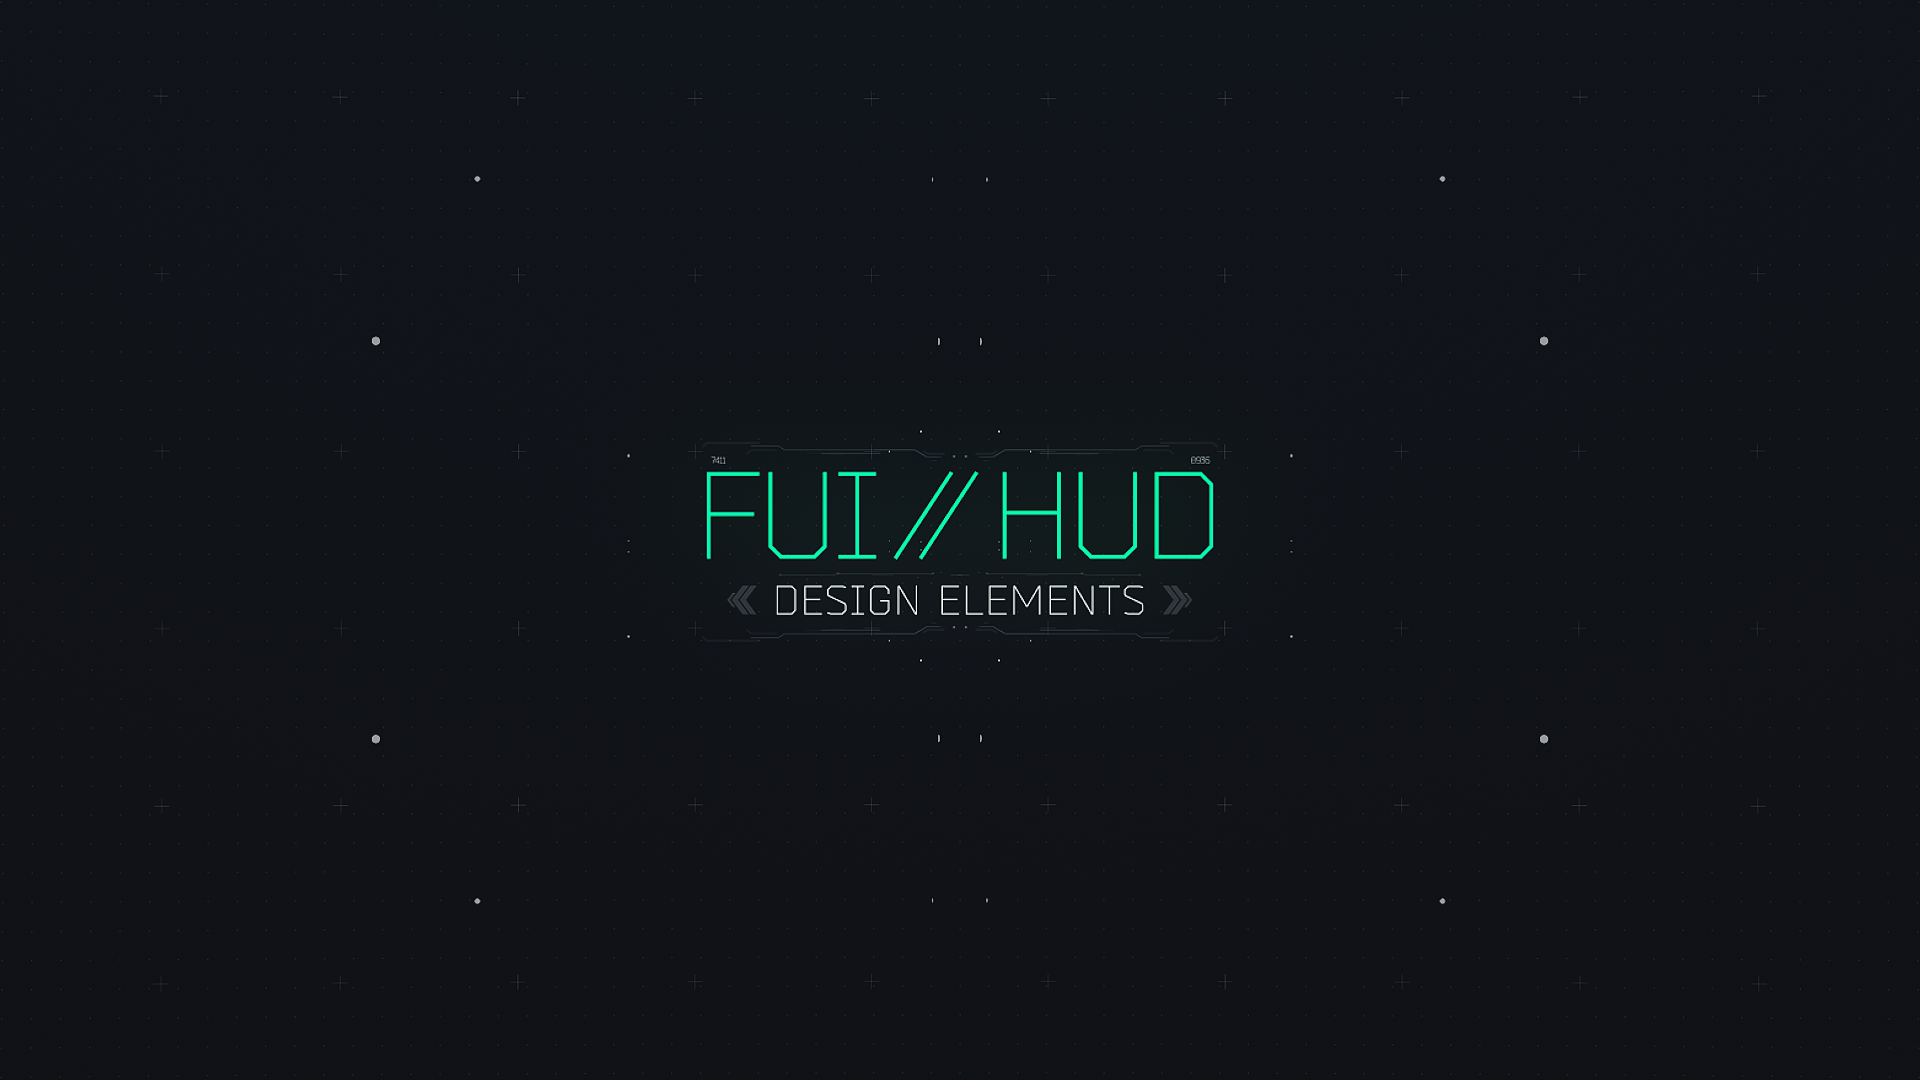 FUI HUD design elements - 1